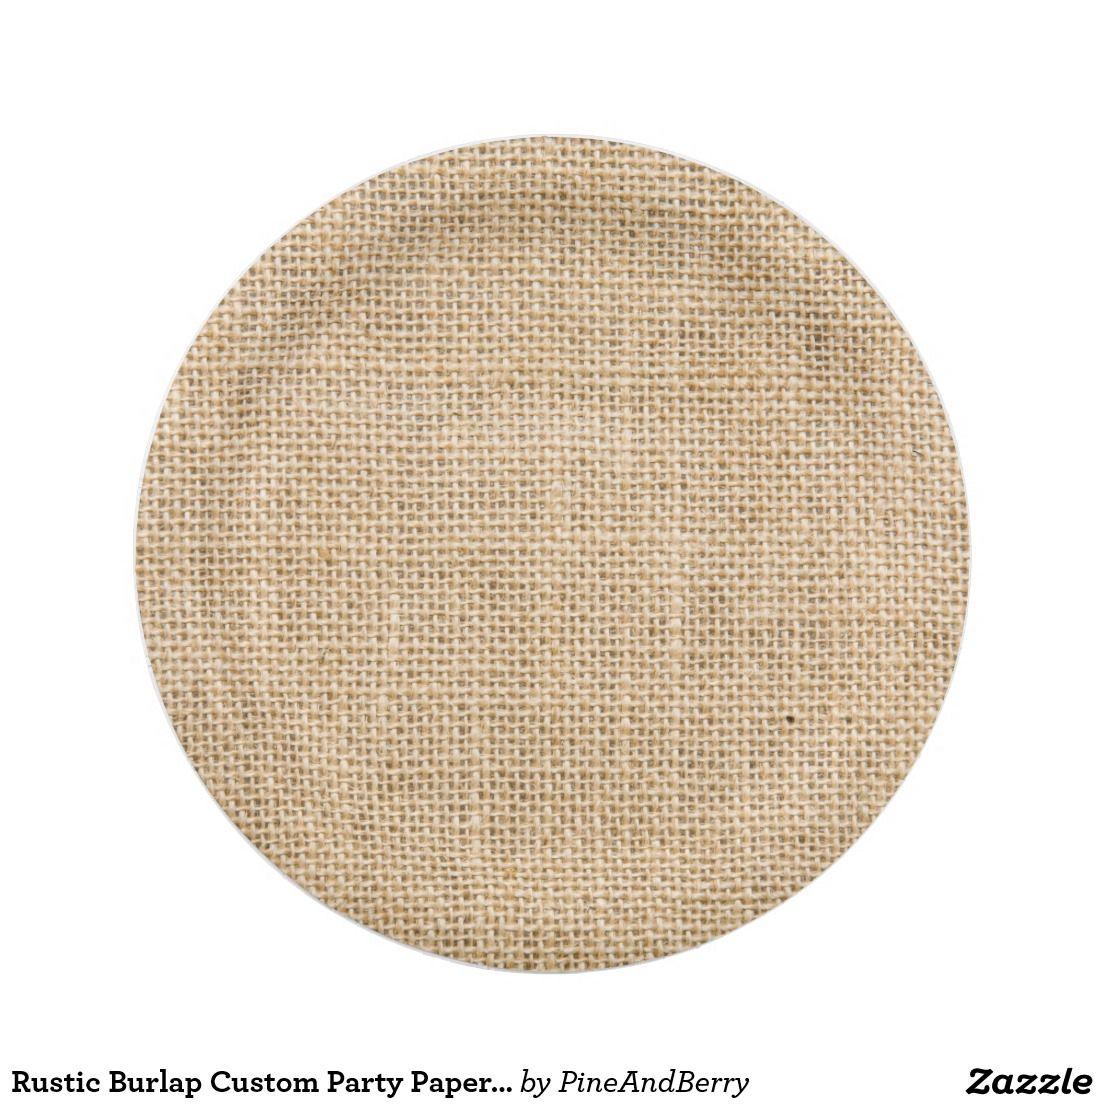 Rustic Burlap Custom Party Paper Plates 7 Inch Plate